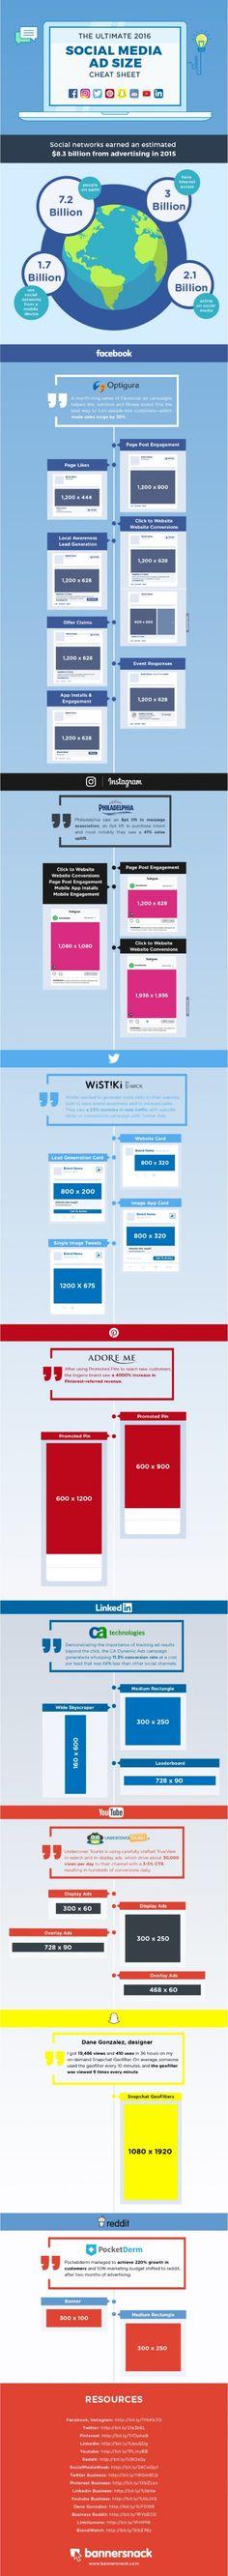 latest-ad-specifications-social-media